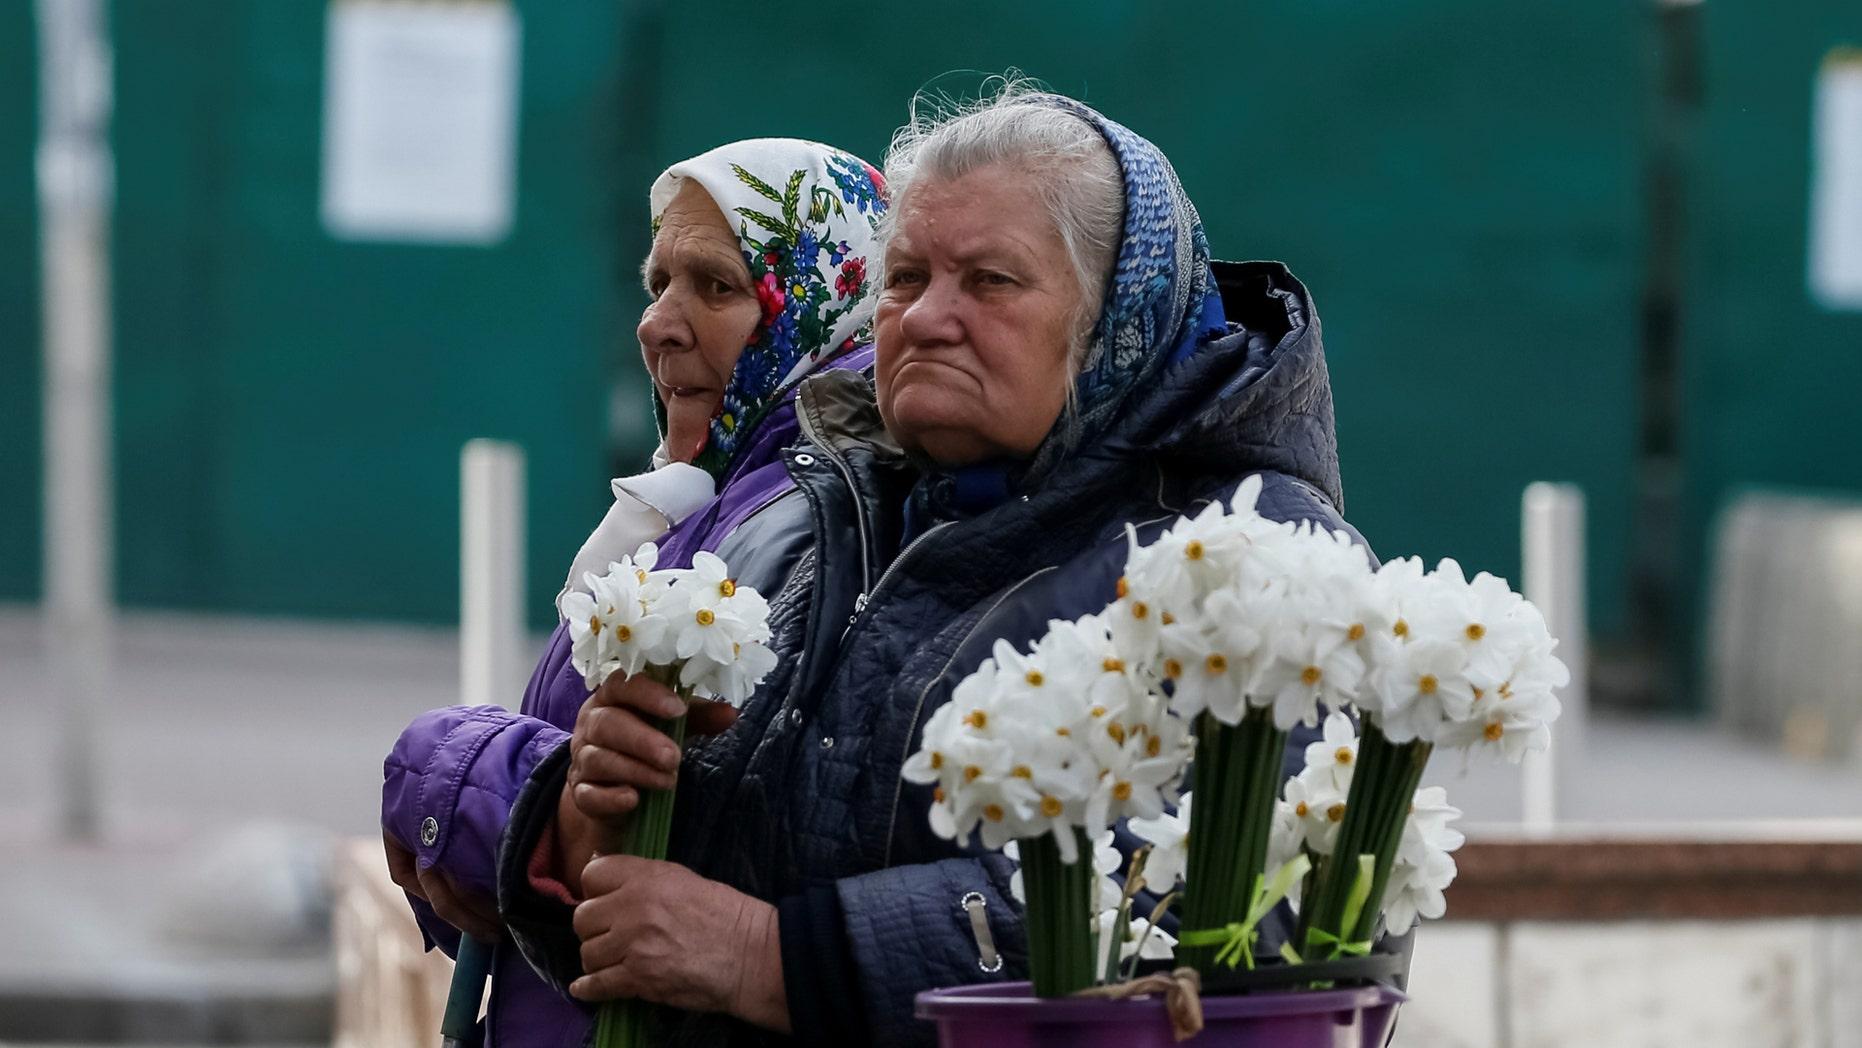 File photo: Elderly women wait for customers as they sell flowers in central Kiev, Ukraine April 27, 2017. (REUTERS/Gleb Garanich)